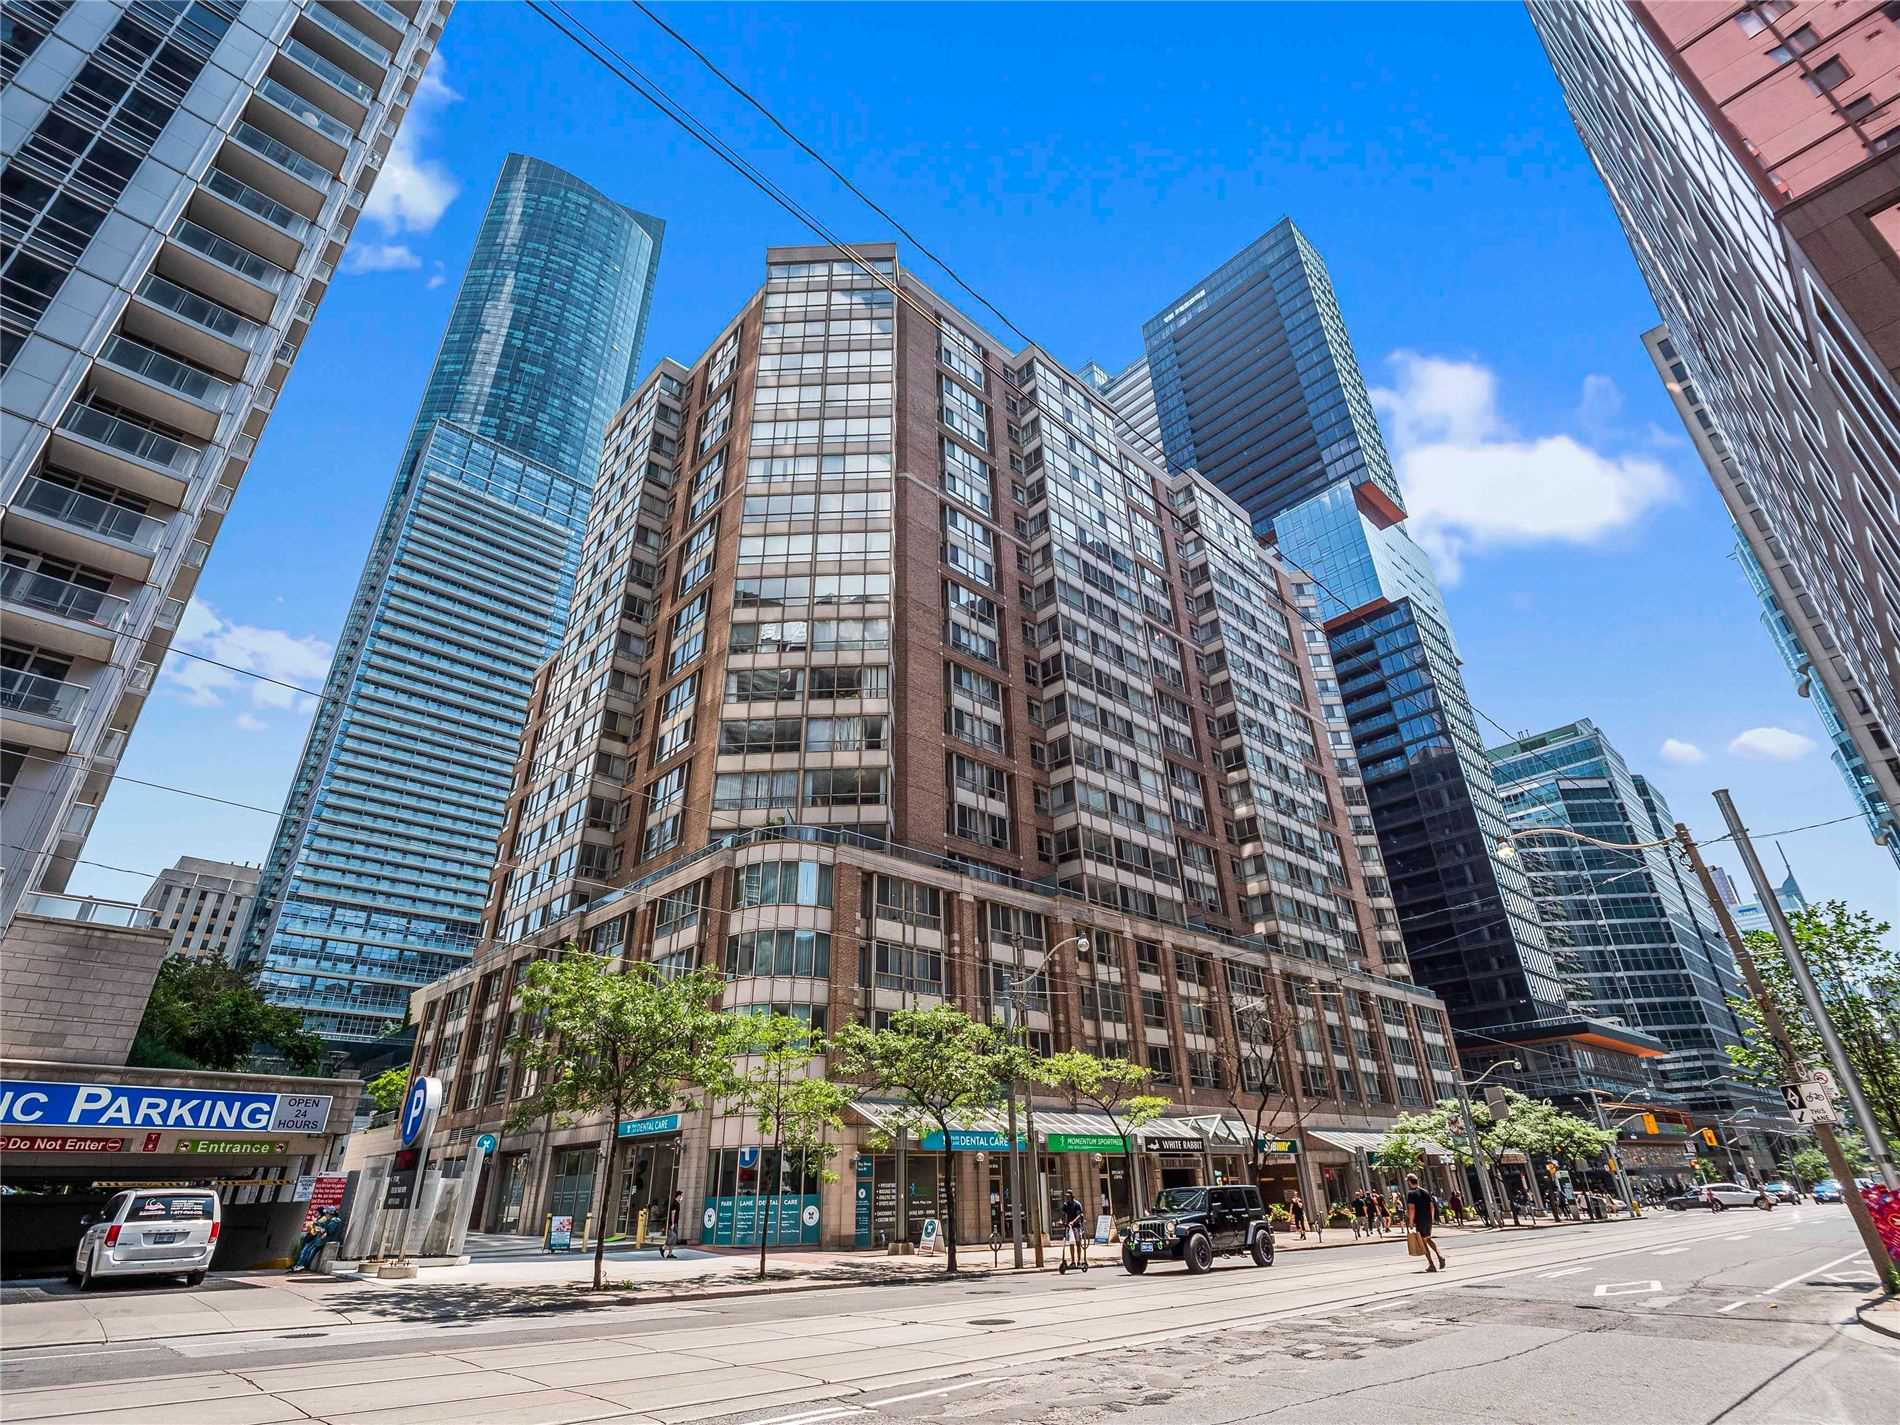 Condo Apt For Sale In Toronto , 2 Bedrooms Bedrooms, ,2 BathroomsBathrooms,Condo Apt,For Sale,1102,Bay